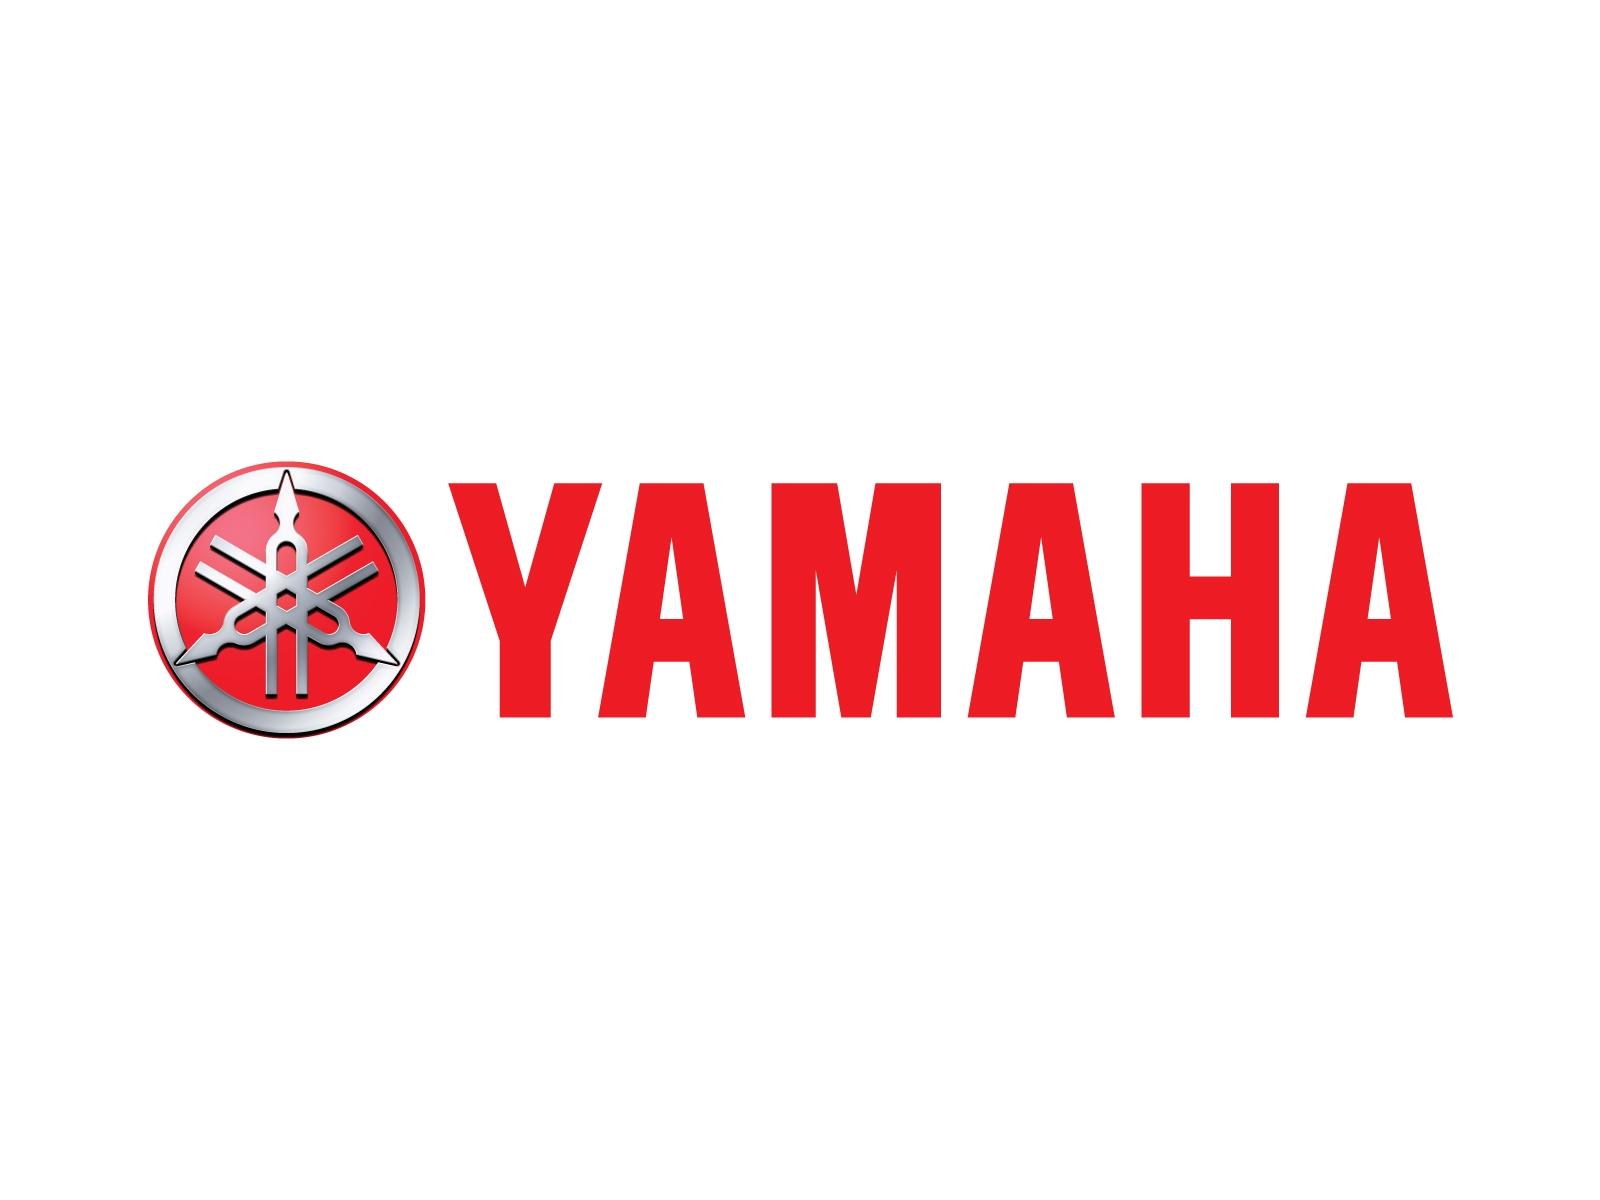 Yamaha Logo WallpapersYamaha R1 Wallpapers and Yamaha R6 Wallpapers 1600x1200